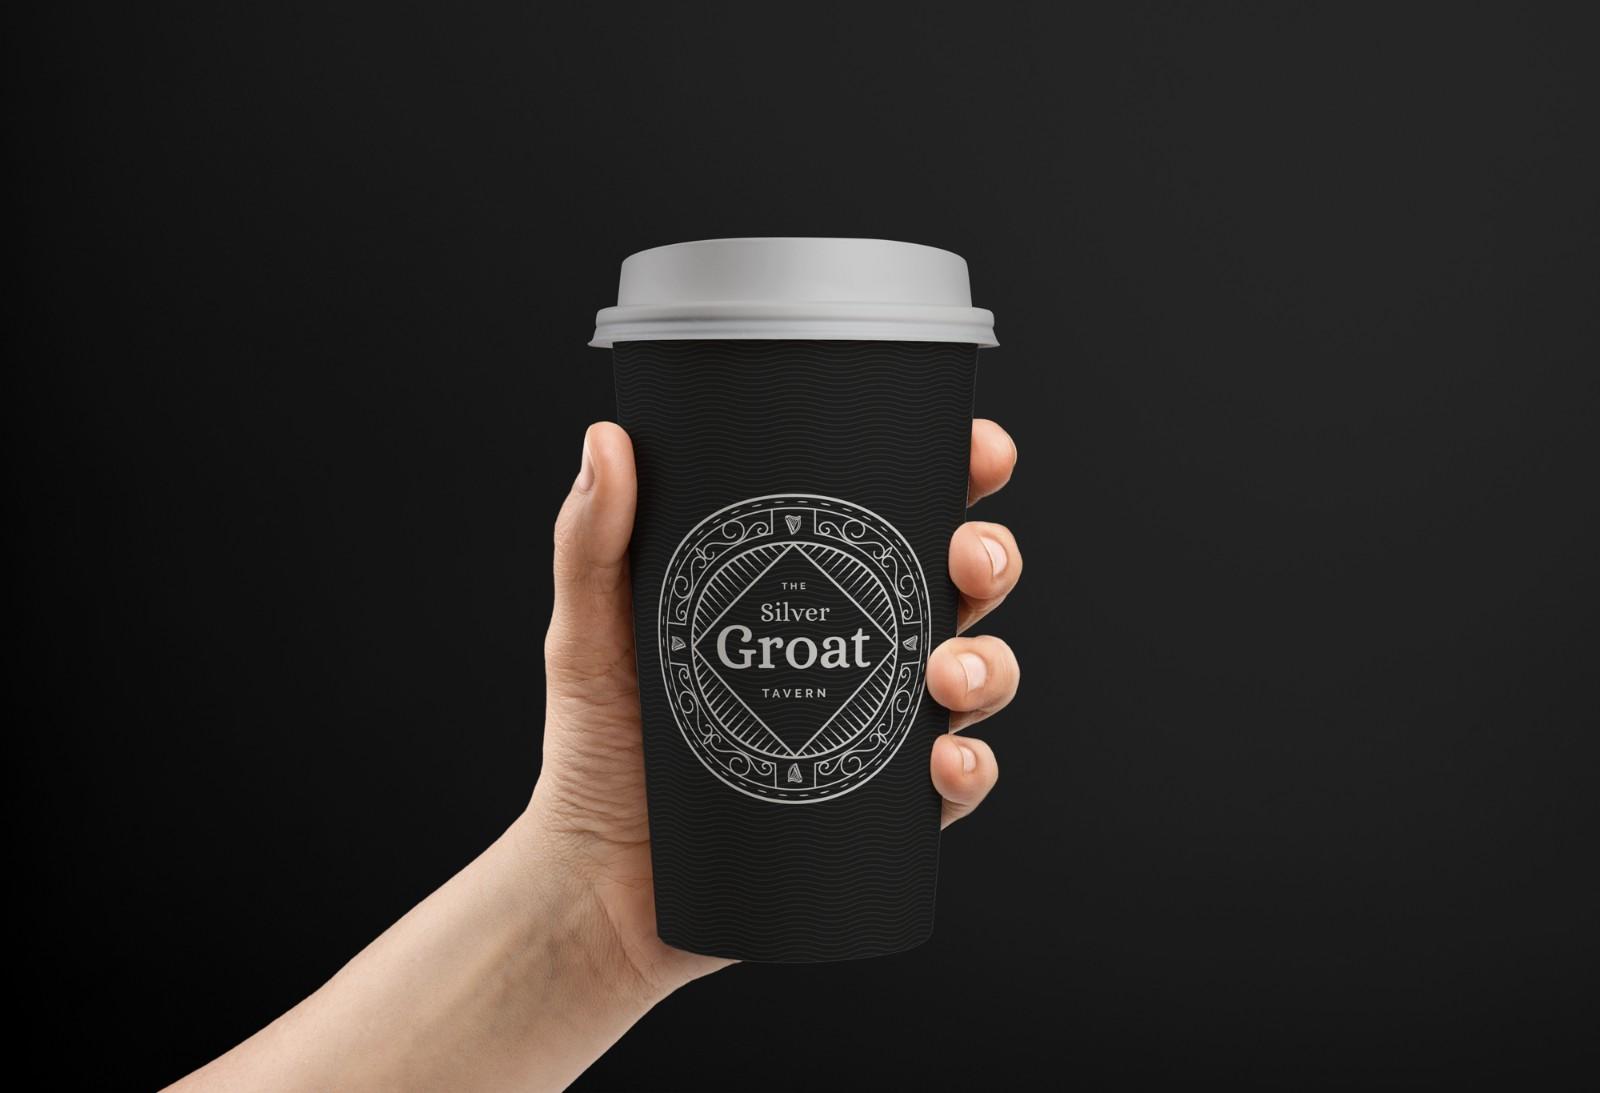 Medium-cup-silver-groat.jpg